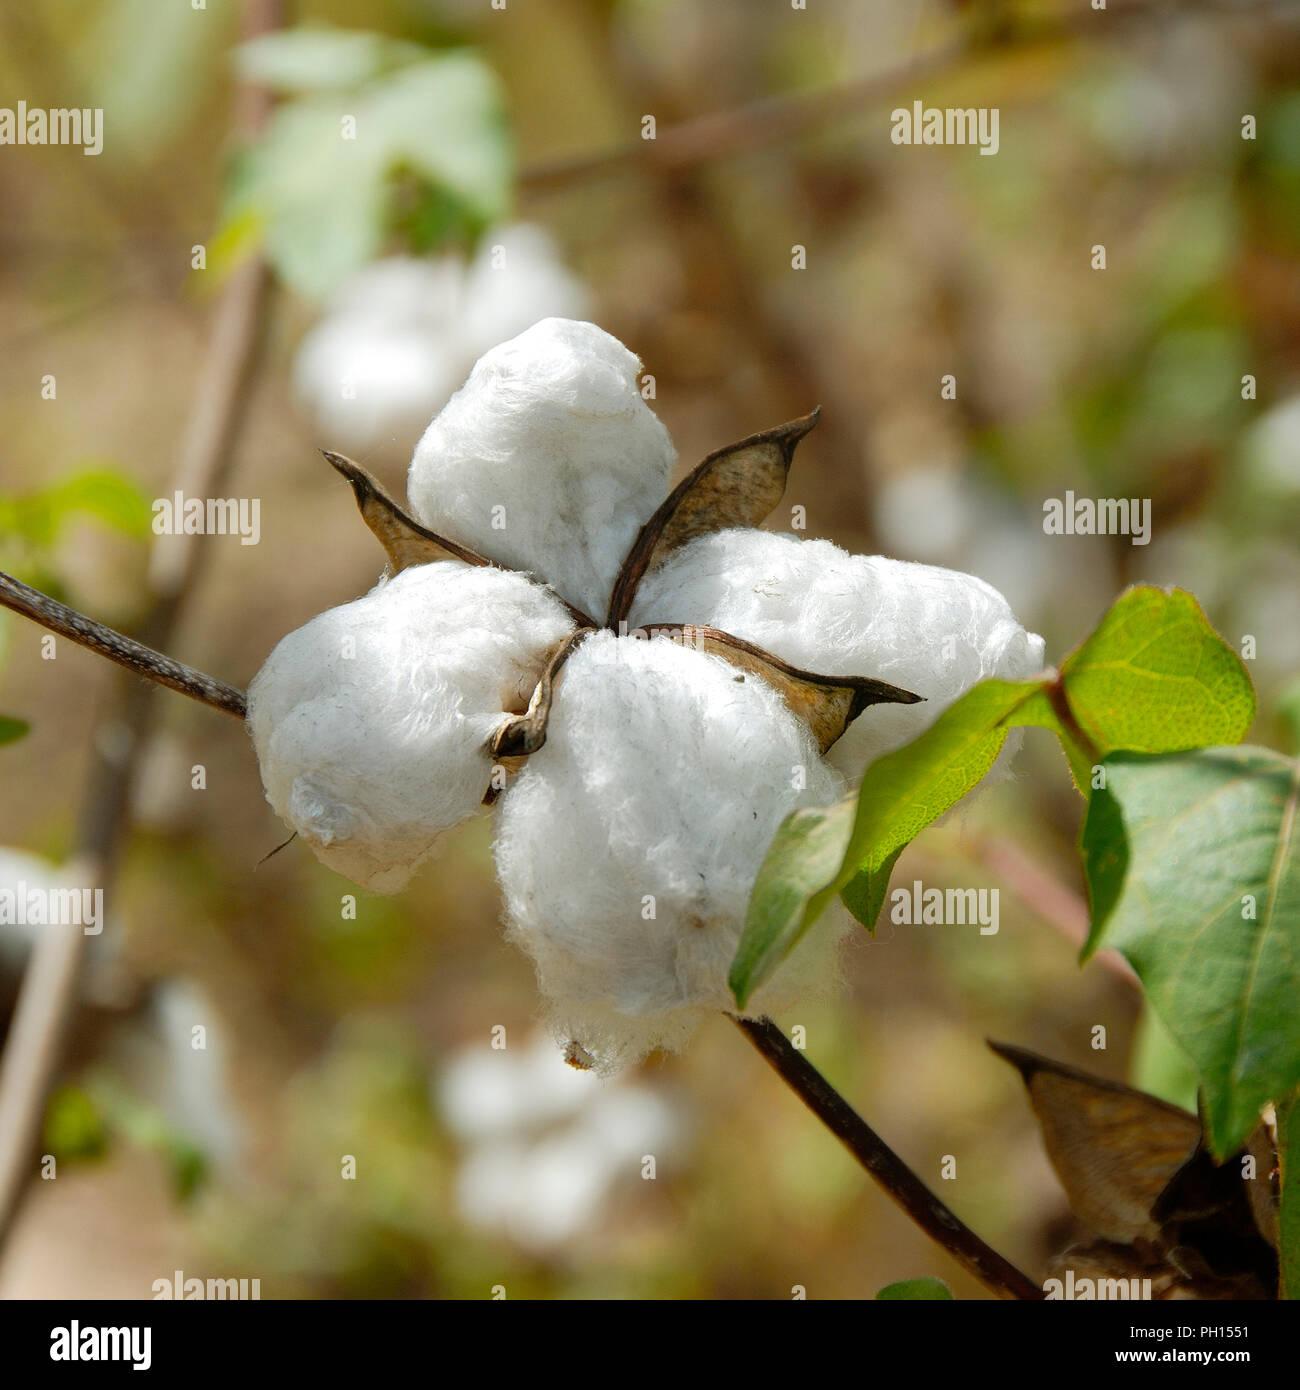 Cotton fields near Ségou, Mali. West Africa - Stock Image